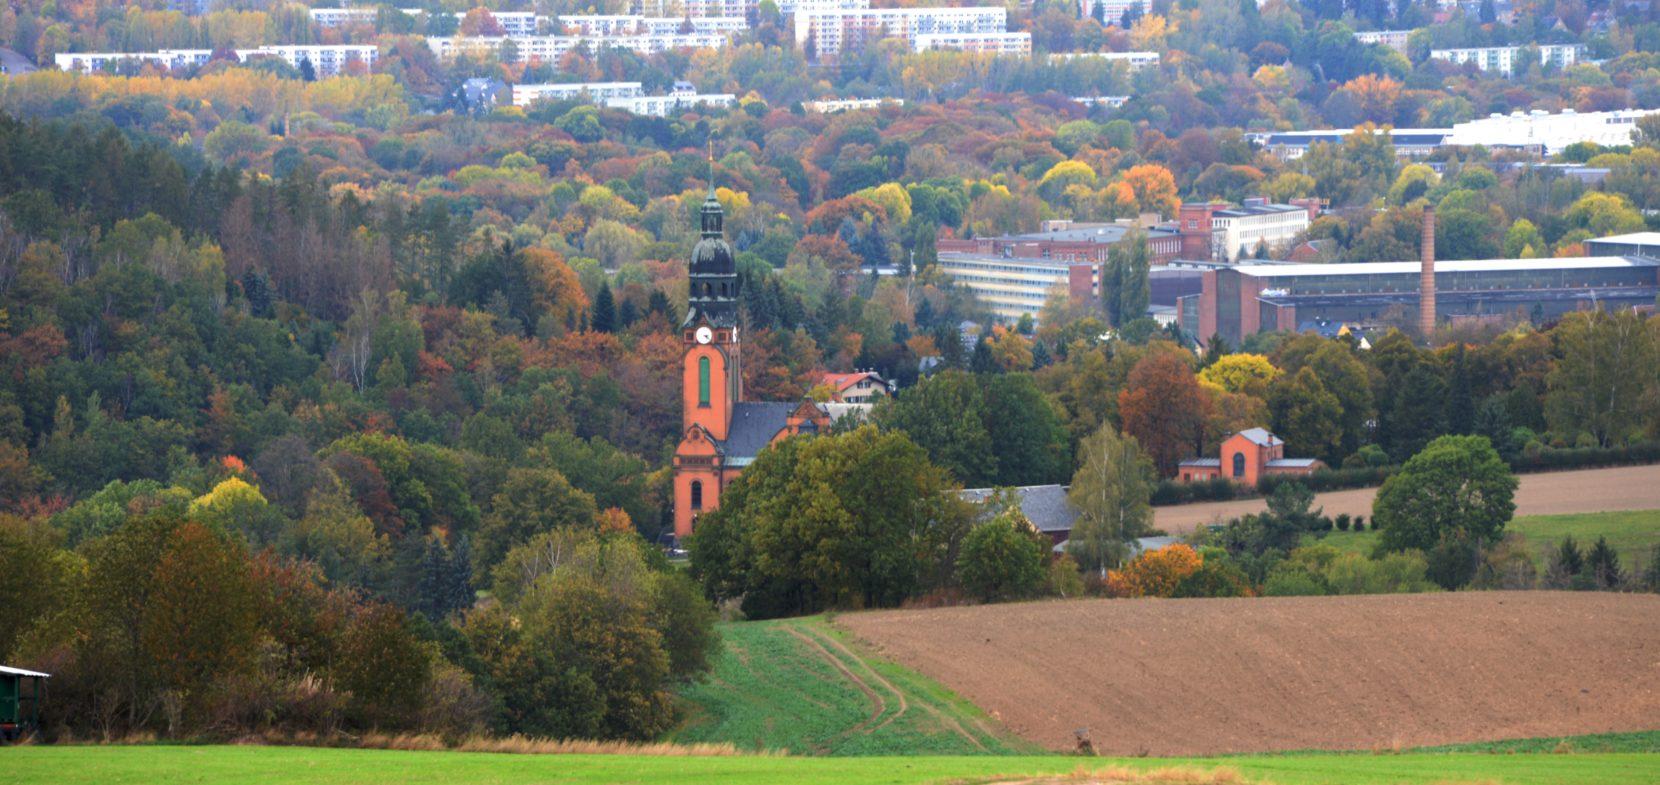 Kirchgemeinde Altchemnitz-Harthau